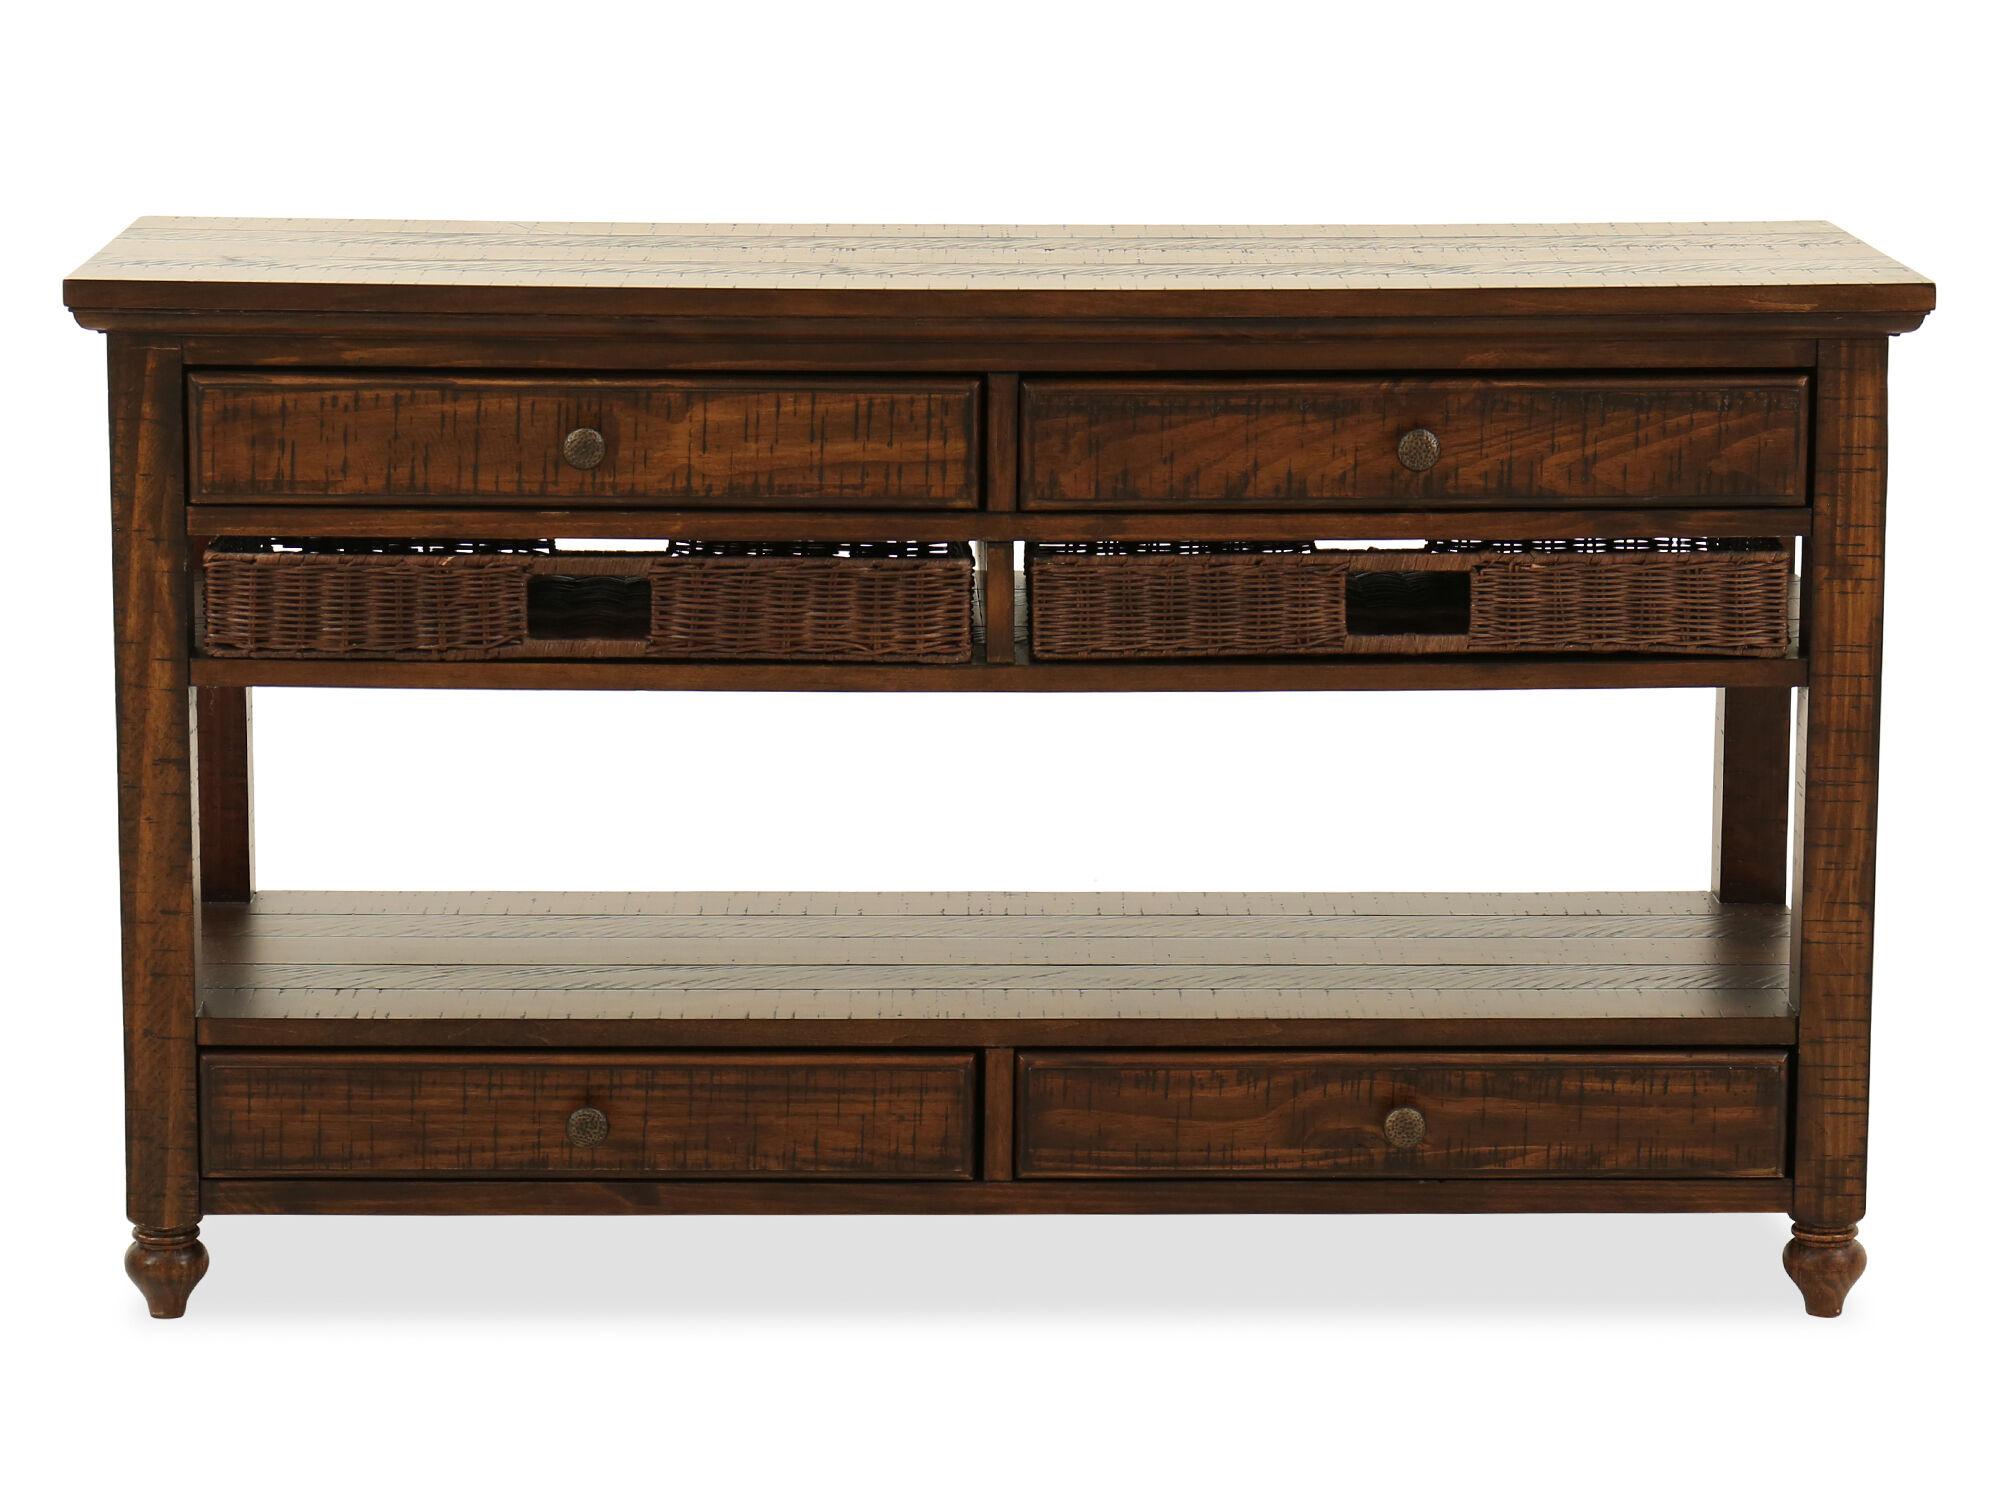 magnussen home cottage lane sofa table - Magnussen Furniture